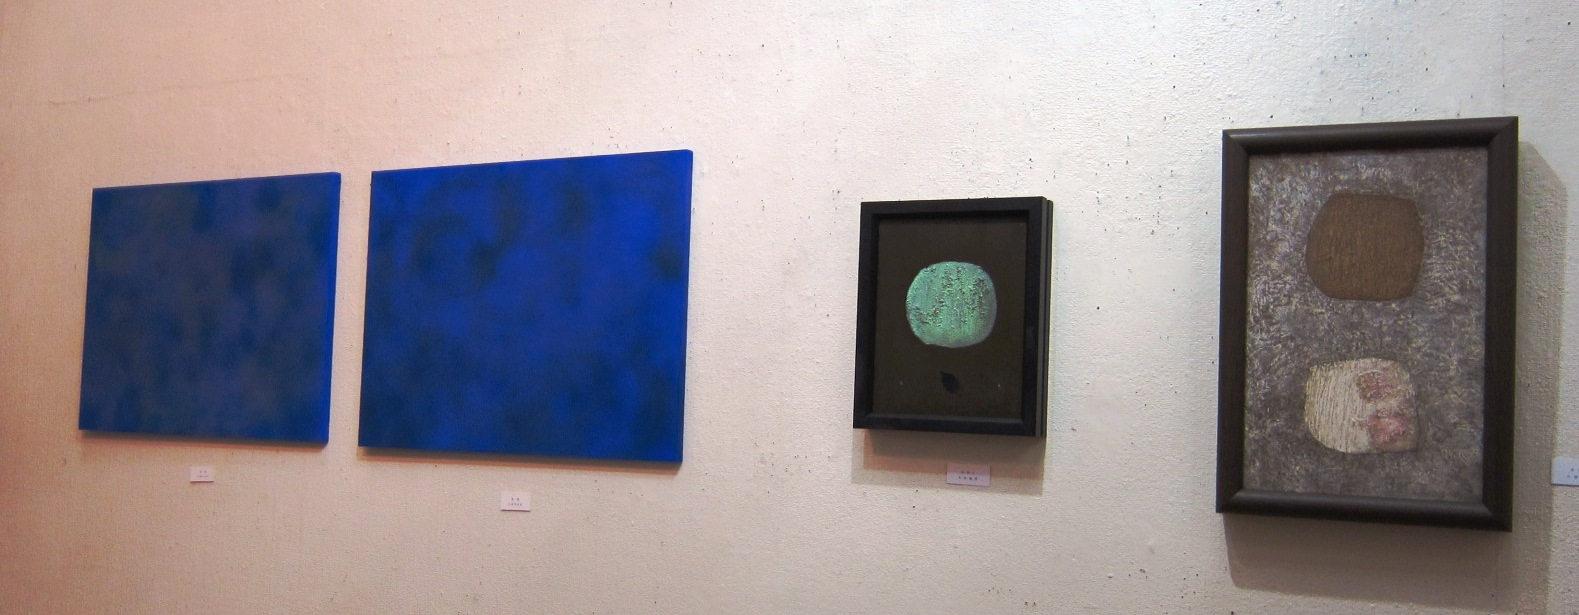 2354) 「LA`TAPIO -Ⅱ- Exhibition」 たぴお 1月27日(月)~2月15日(土)_f0126829_1055484.jpg